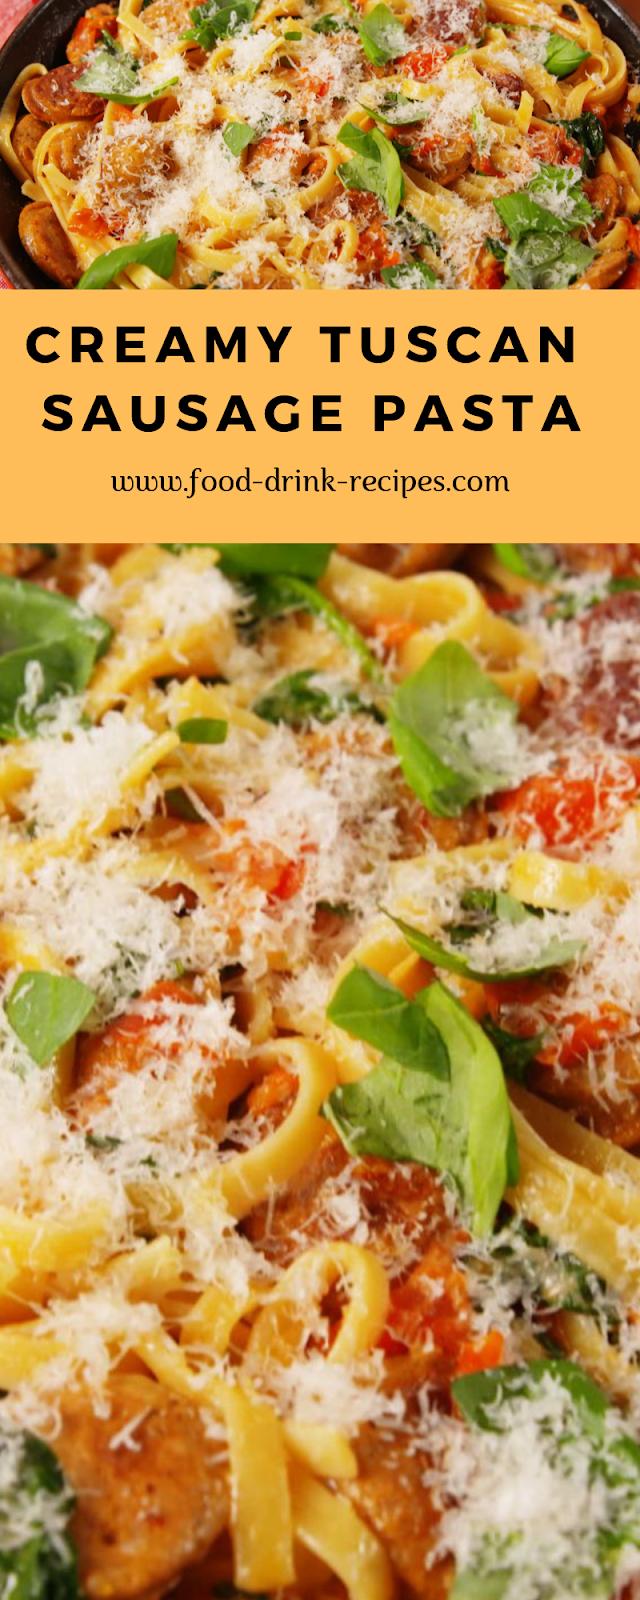 Creamy Tuscan Sausage Pasta